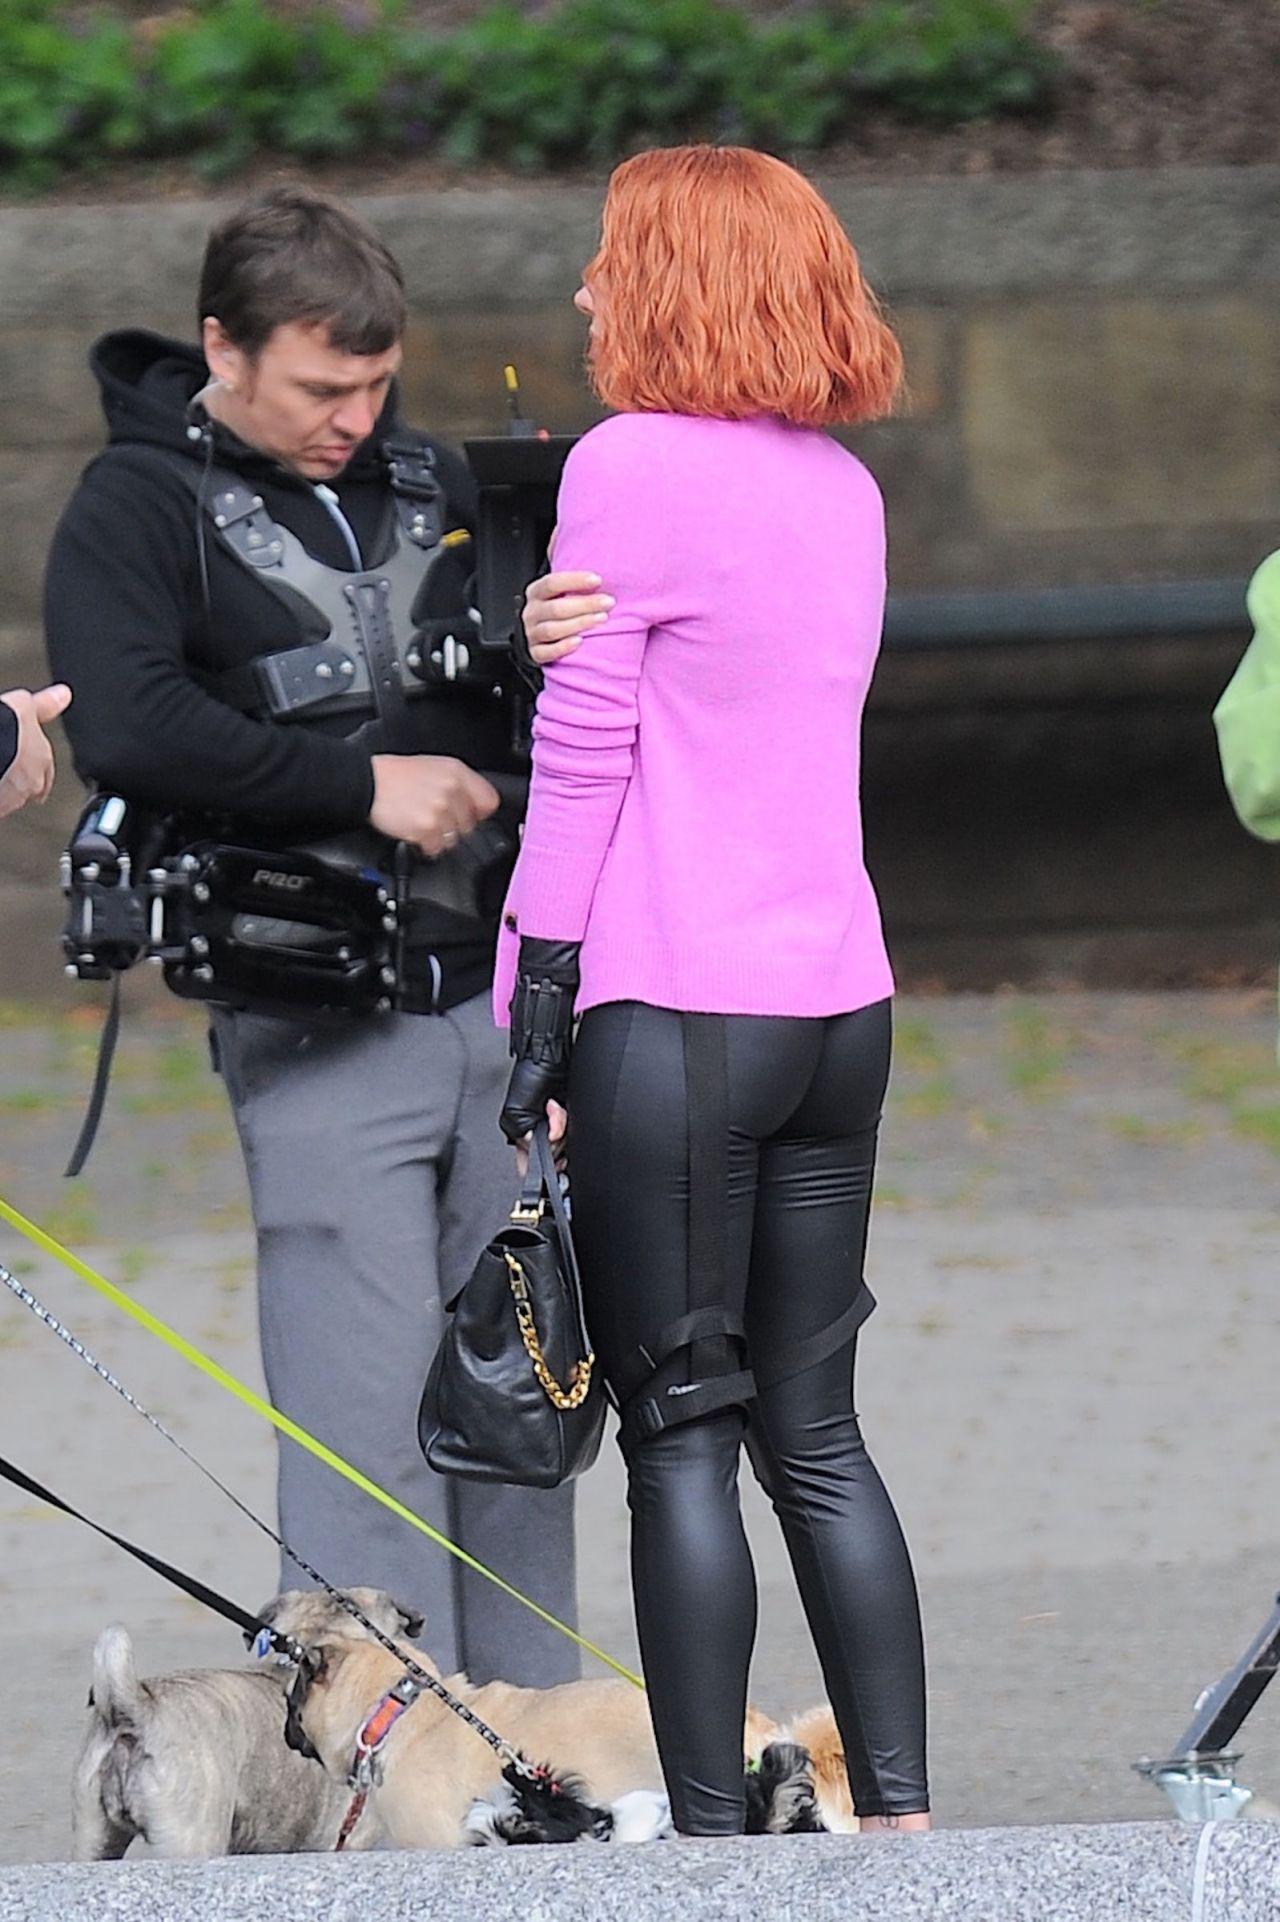 Scarlett Johansson Filming Scenes For Saturday Night